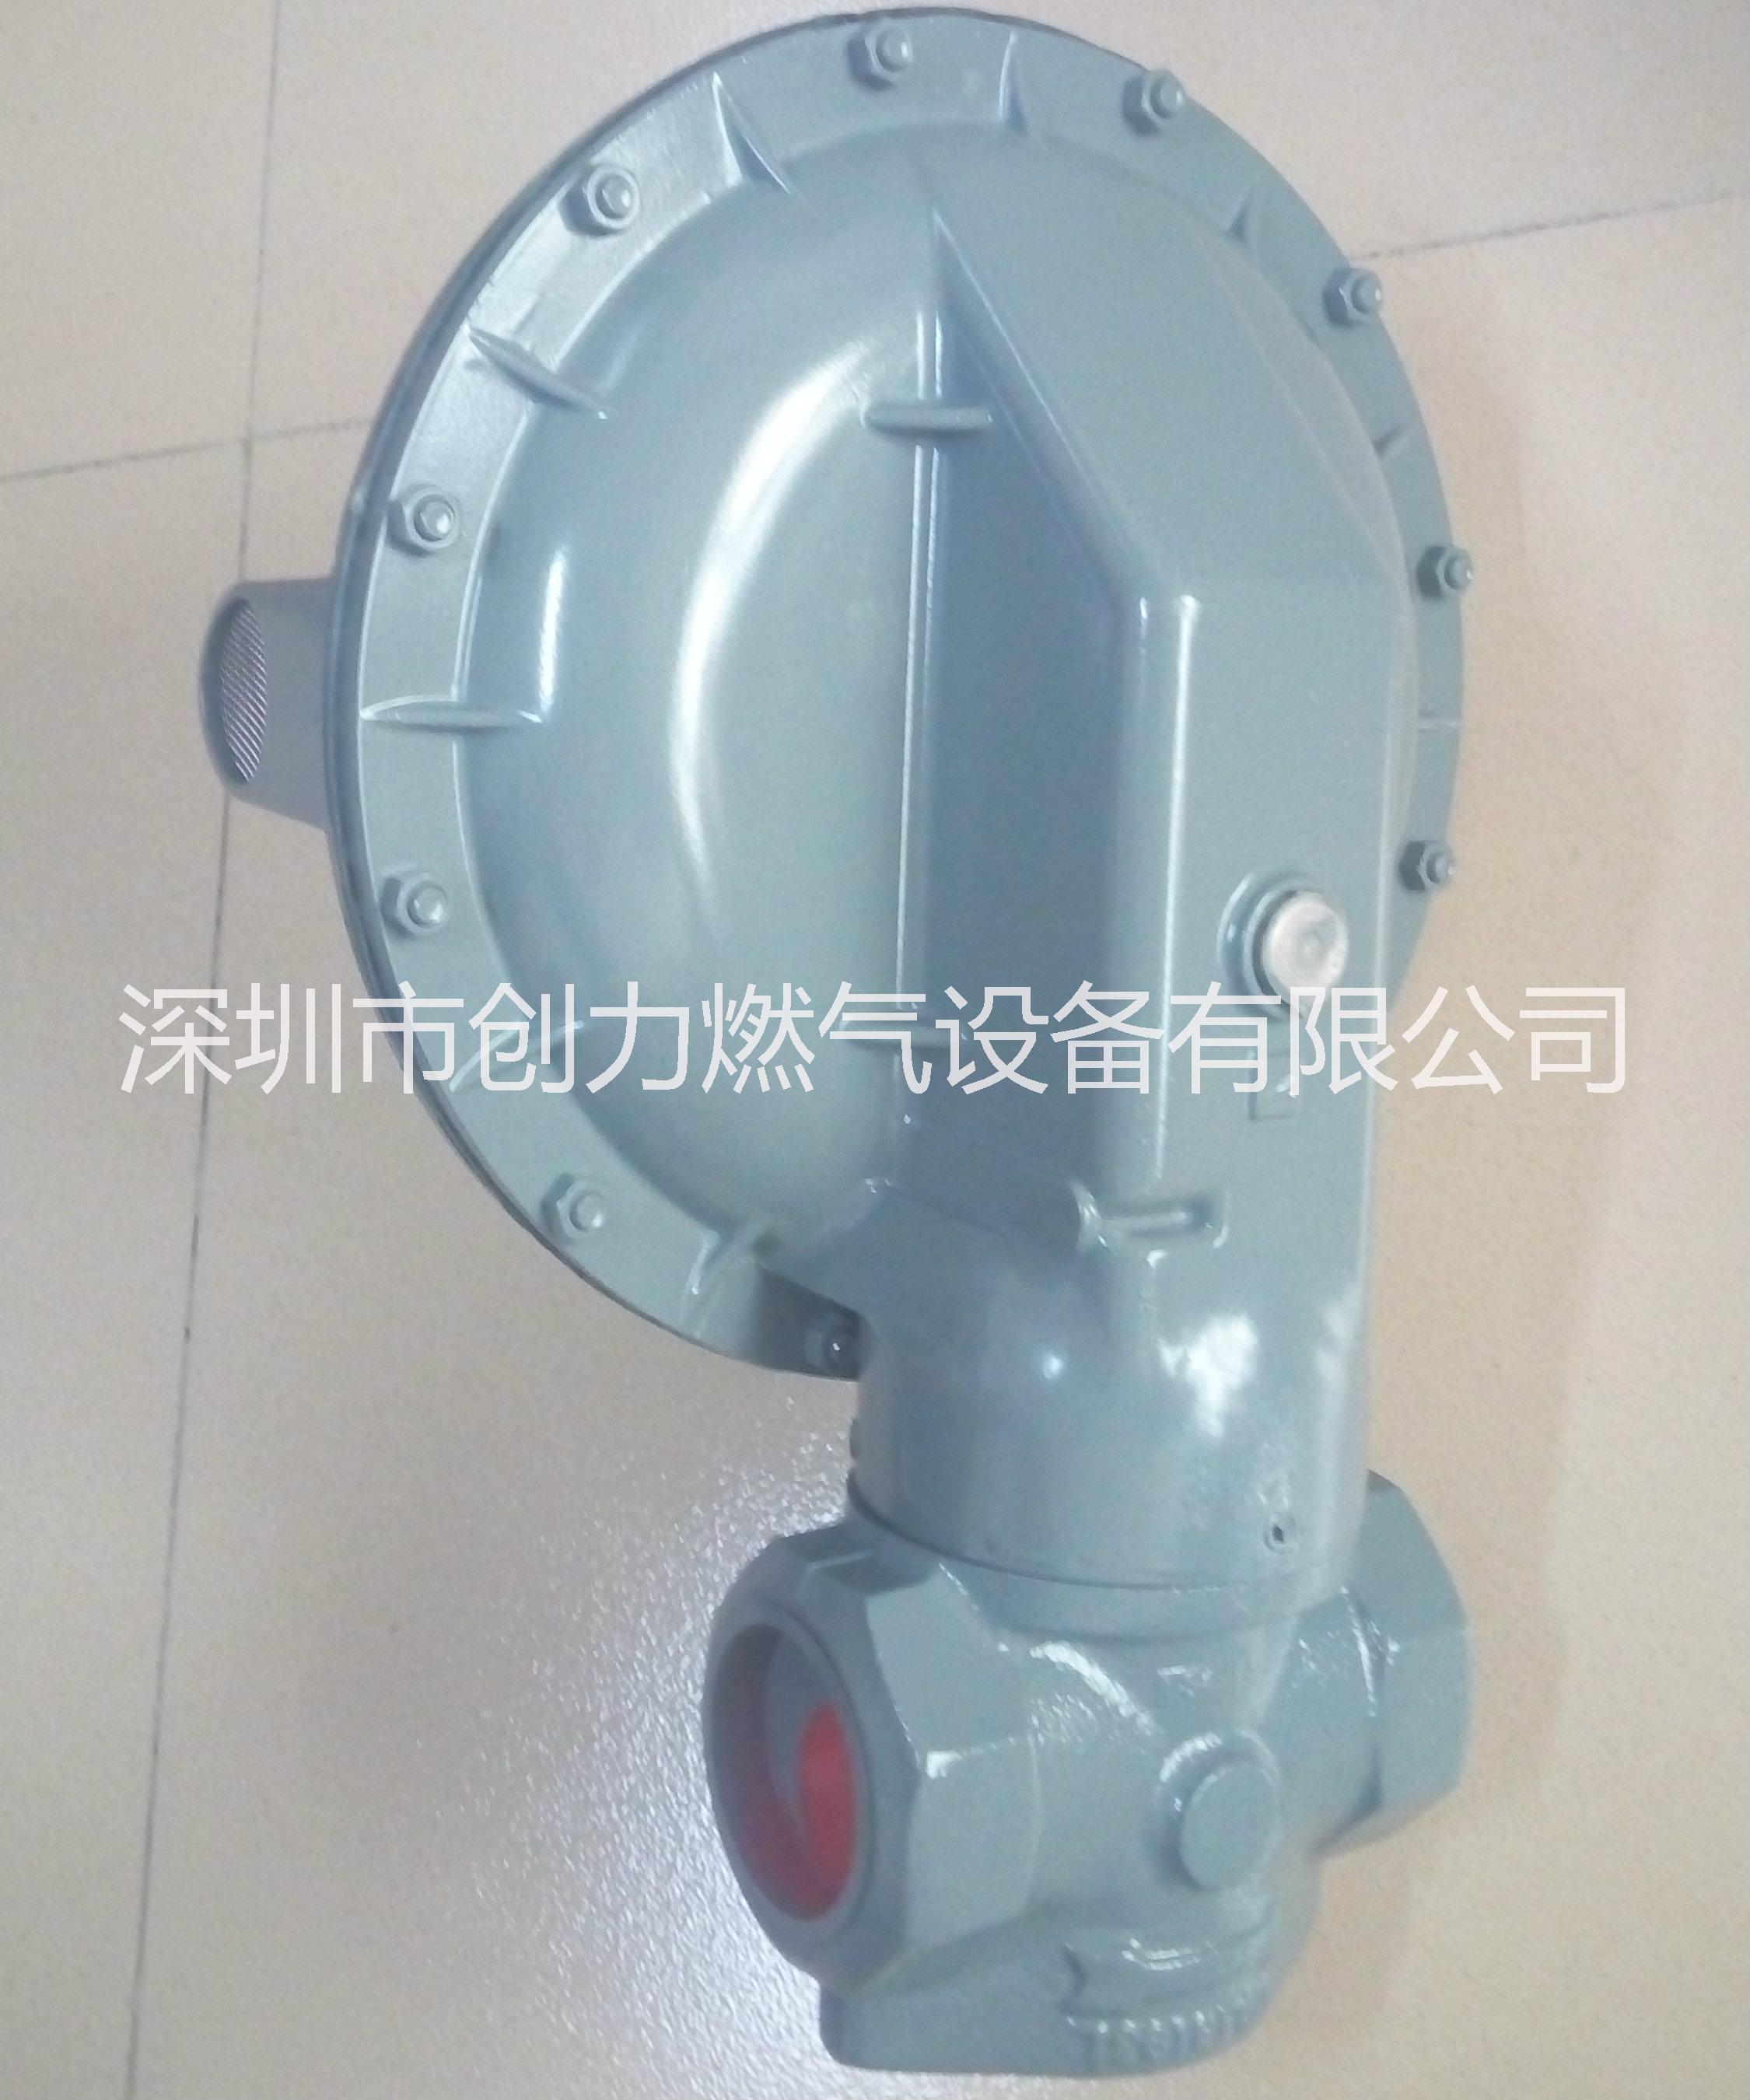 AMCO压力控制阀1803调压器图片/AMCO压力控制阀1803调压器样板图 (3)